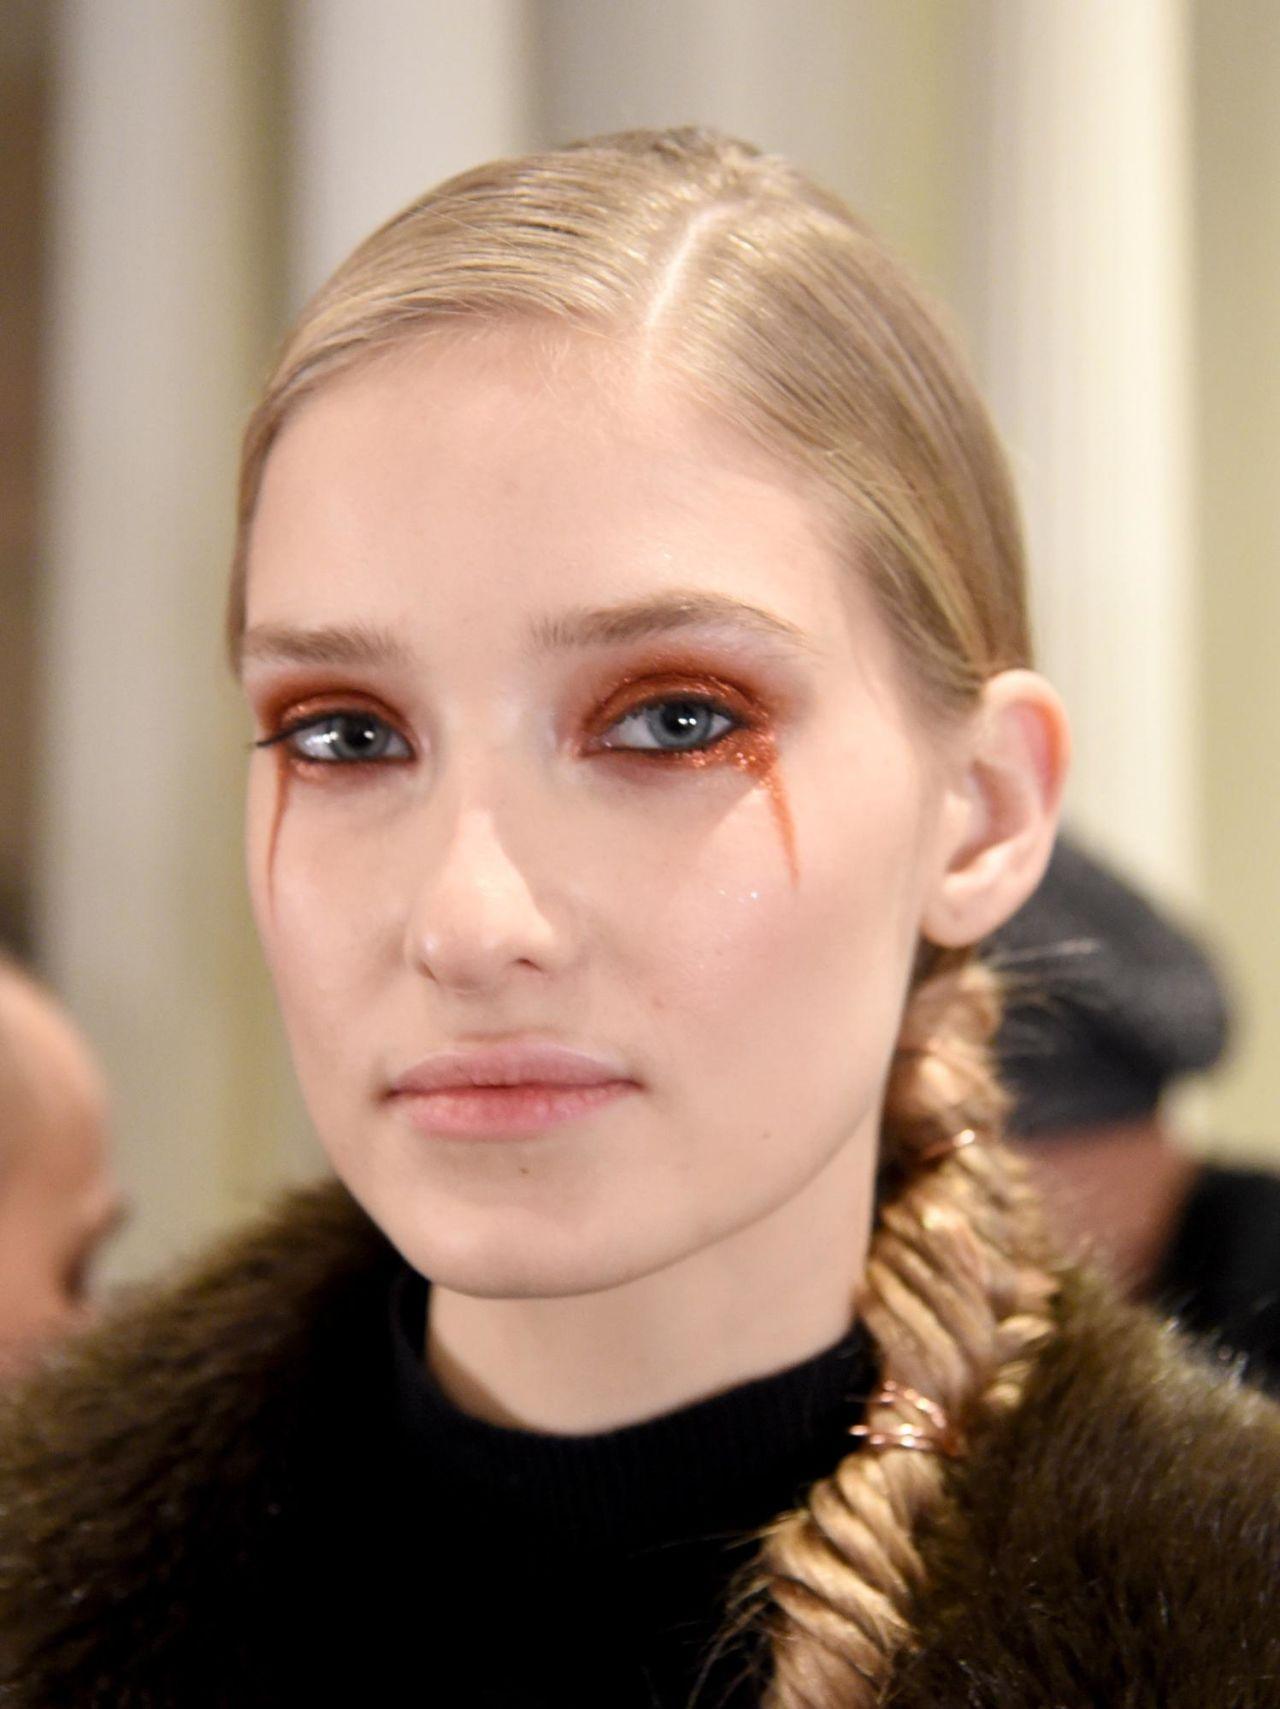 7 Runway-Inspired Eye Makeup Looks to Try